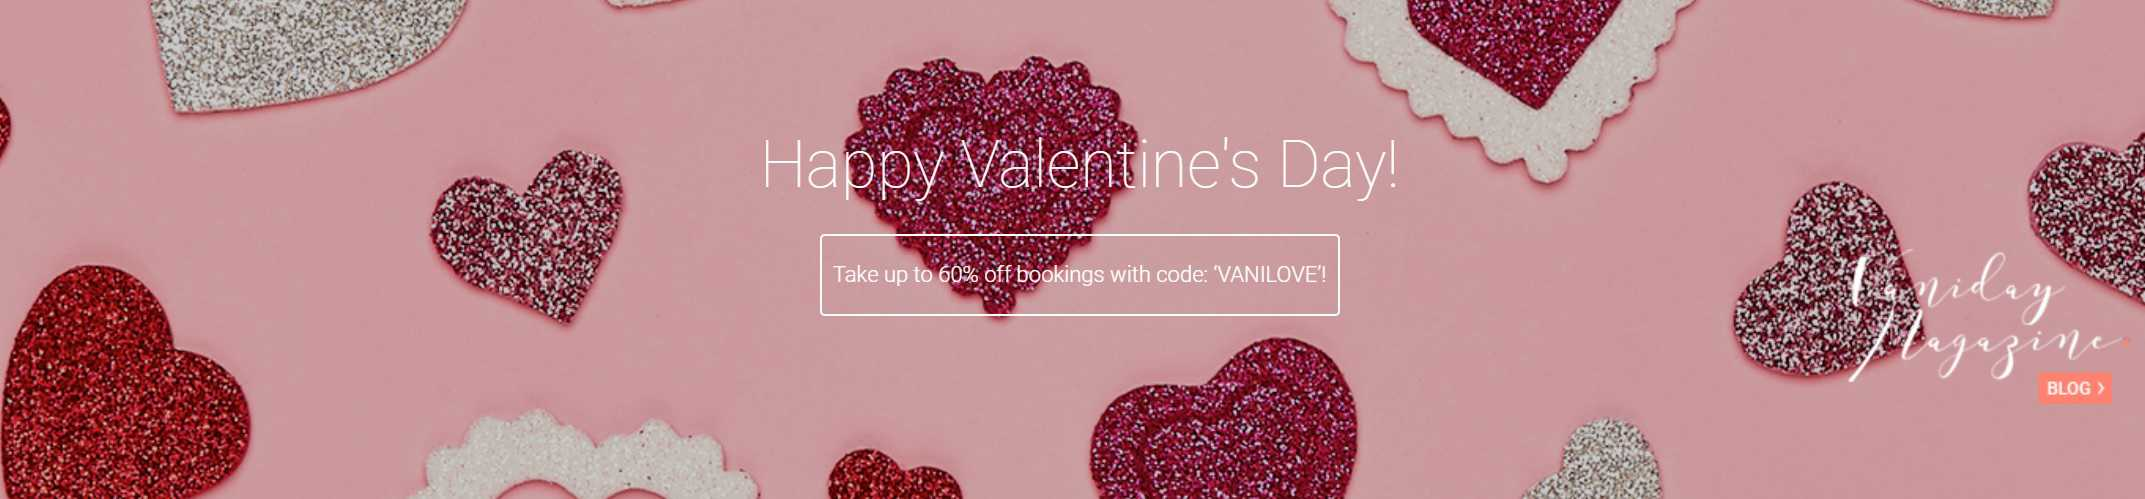 vaniday valentine's day